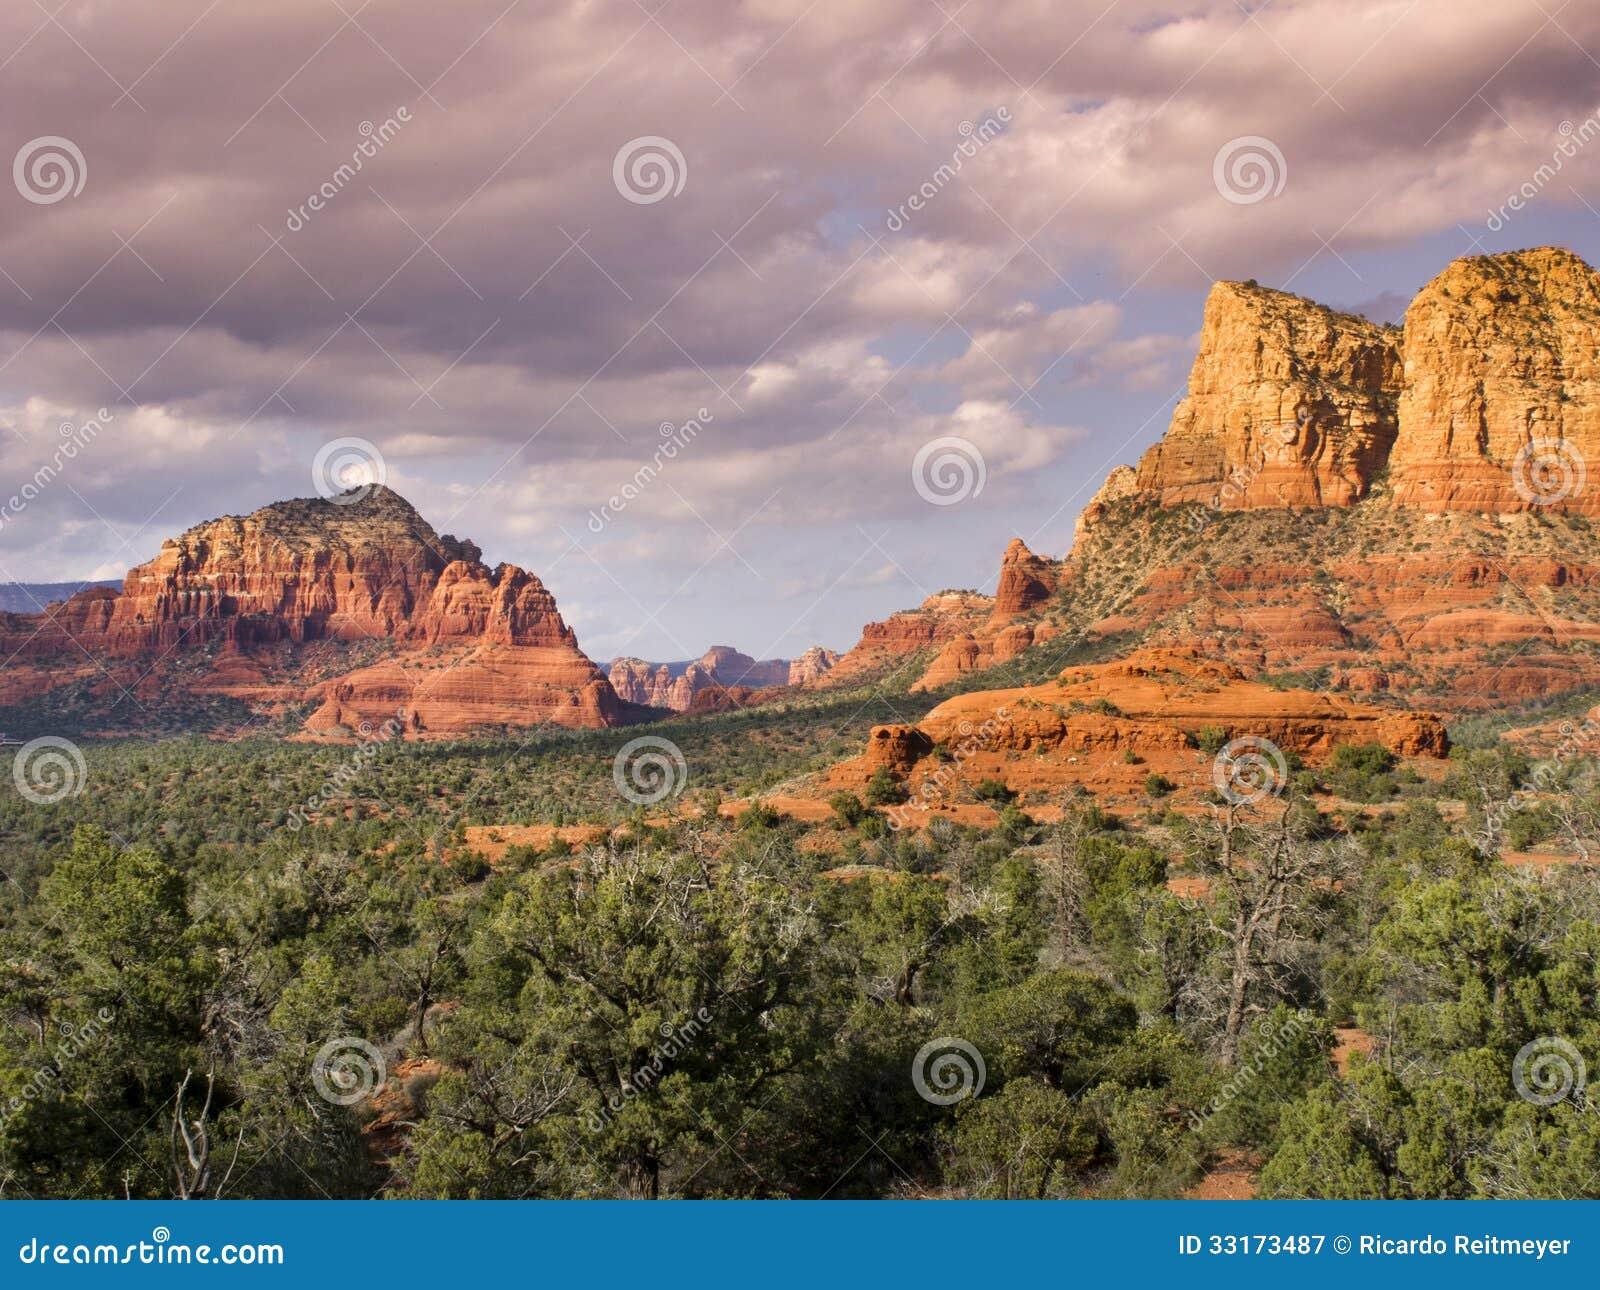 Sedona Arizona Hiking Trail Leads To Amazing Deser Royalty